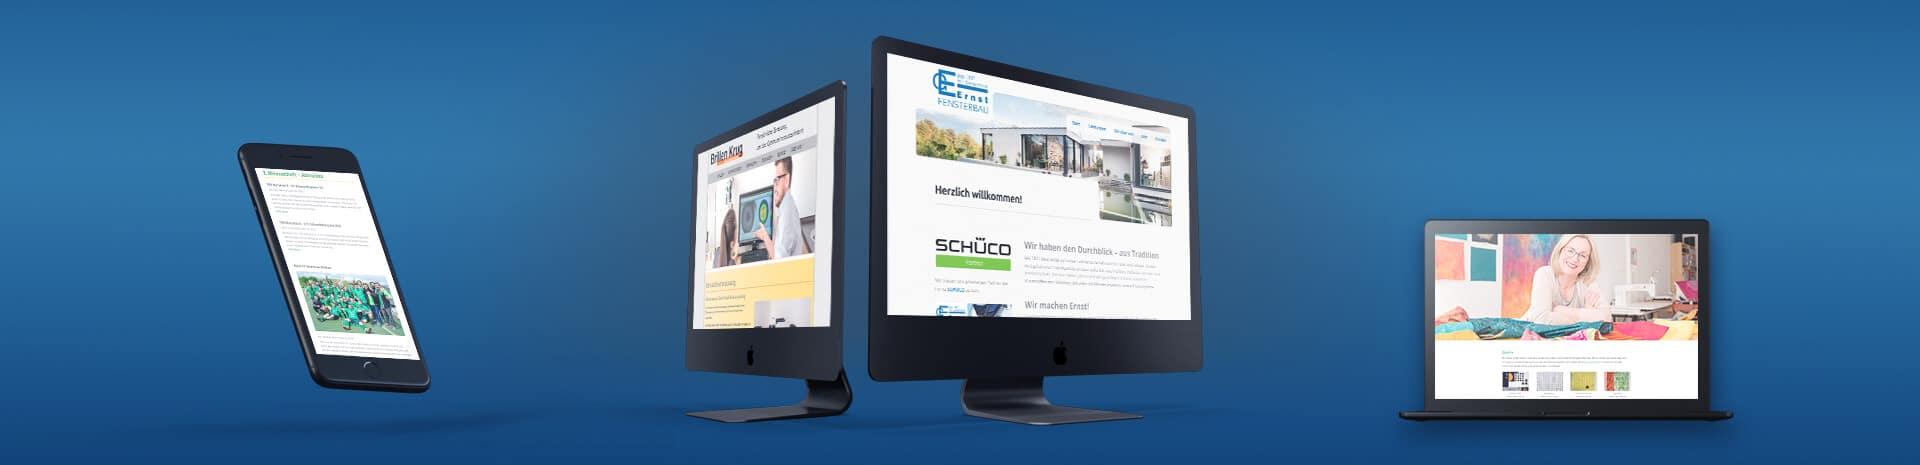 Headerbild Webdesign: Referenzen - Stephan-Benz.de